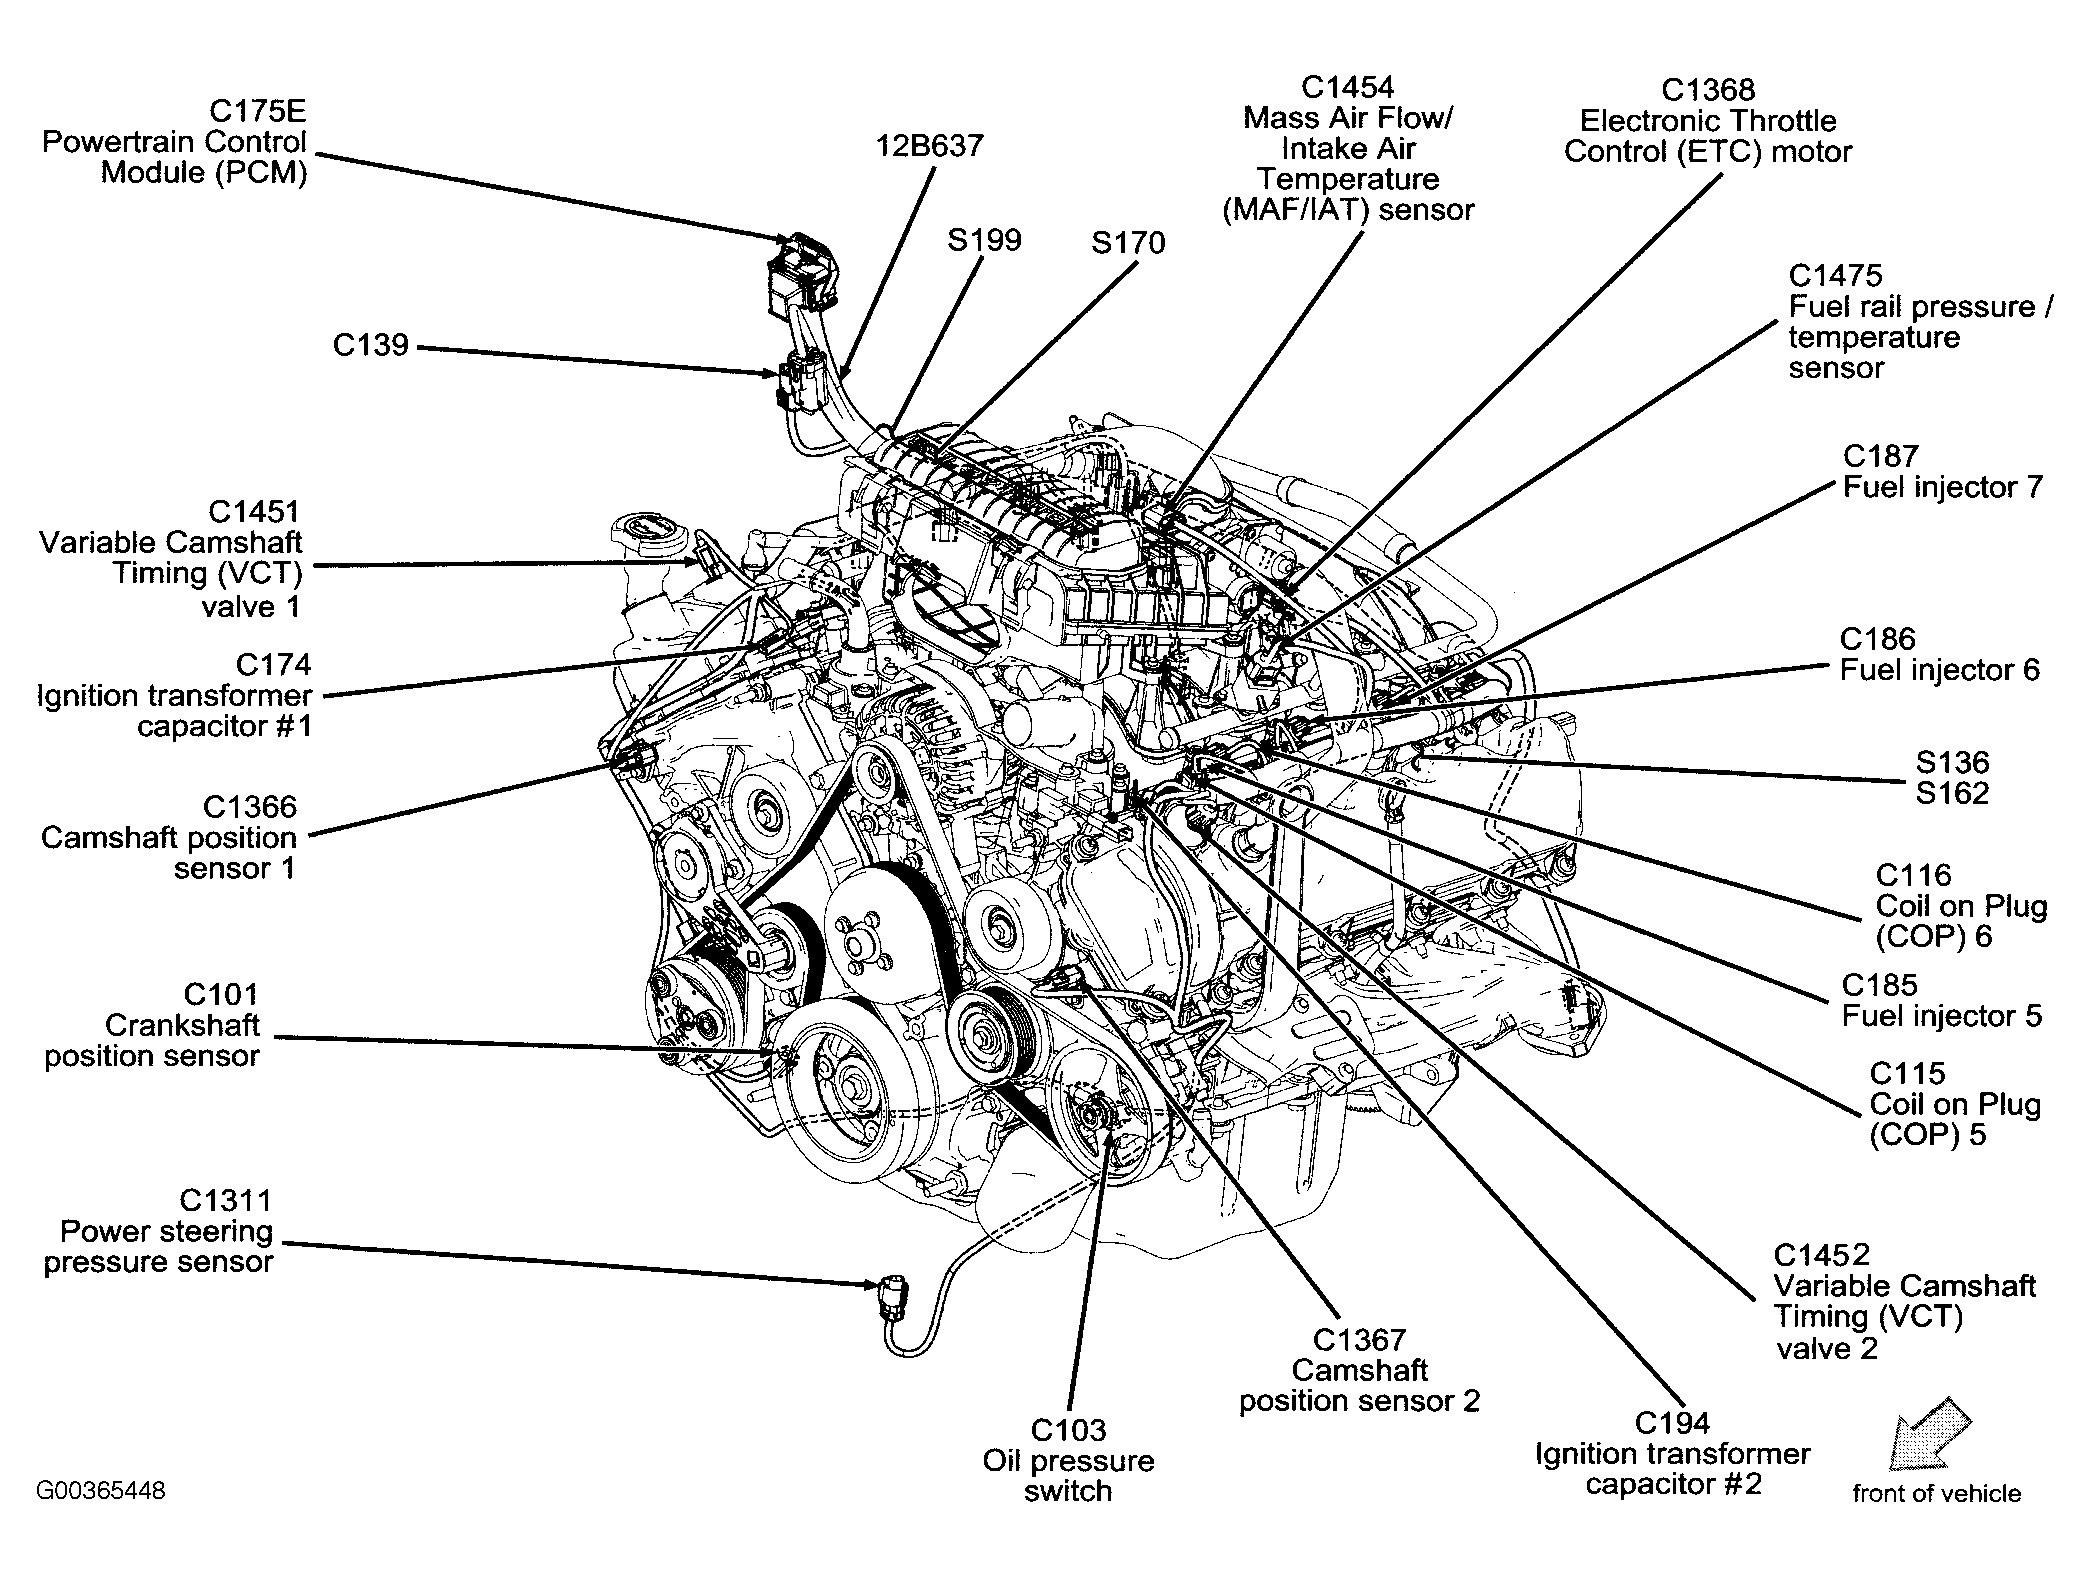 2003 ford Explorer Engine Diagram 2001 ford F250 Engine Diagram Wiring Diagram Datasource Of 2003 ford Explorer Engine Diagram